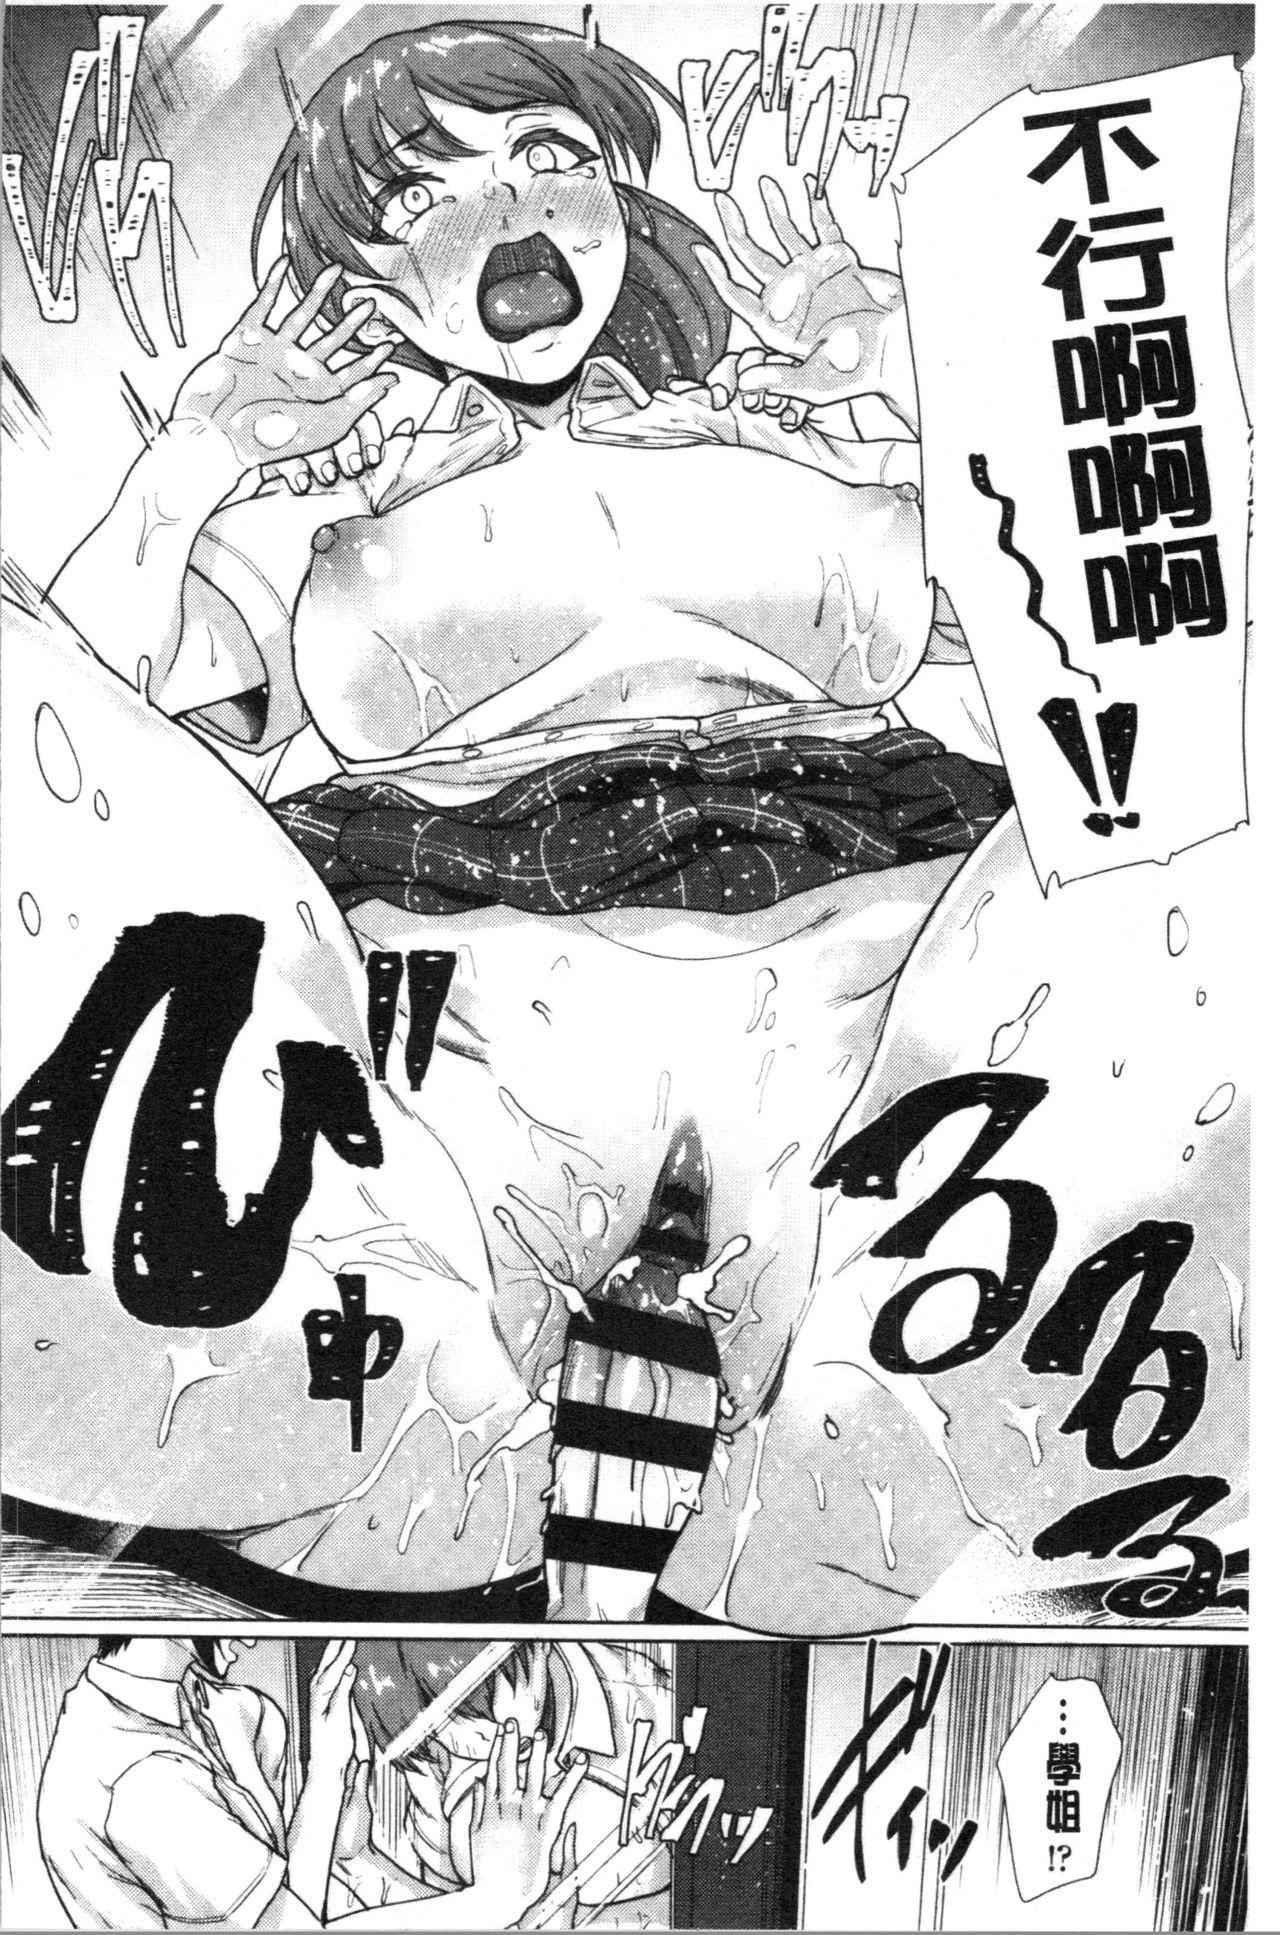 Kanojo ga SEX ni nare teru wake | 女友對激情性愛變很習慣的理由 62